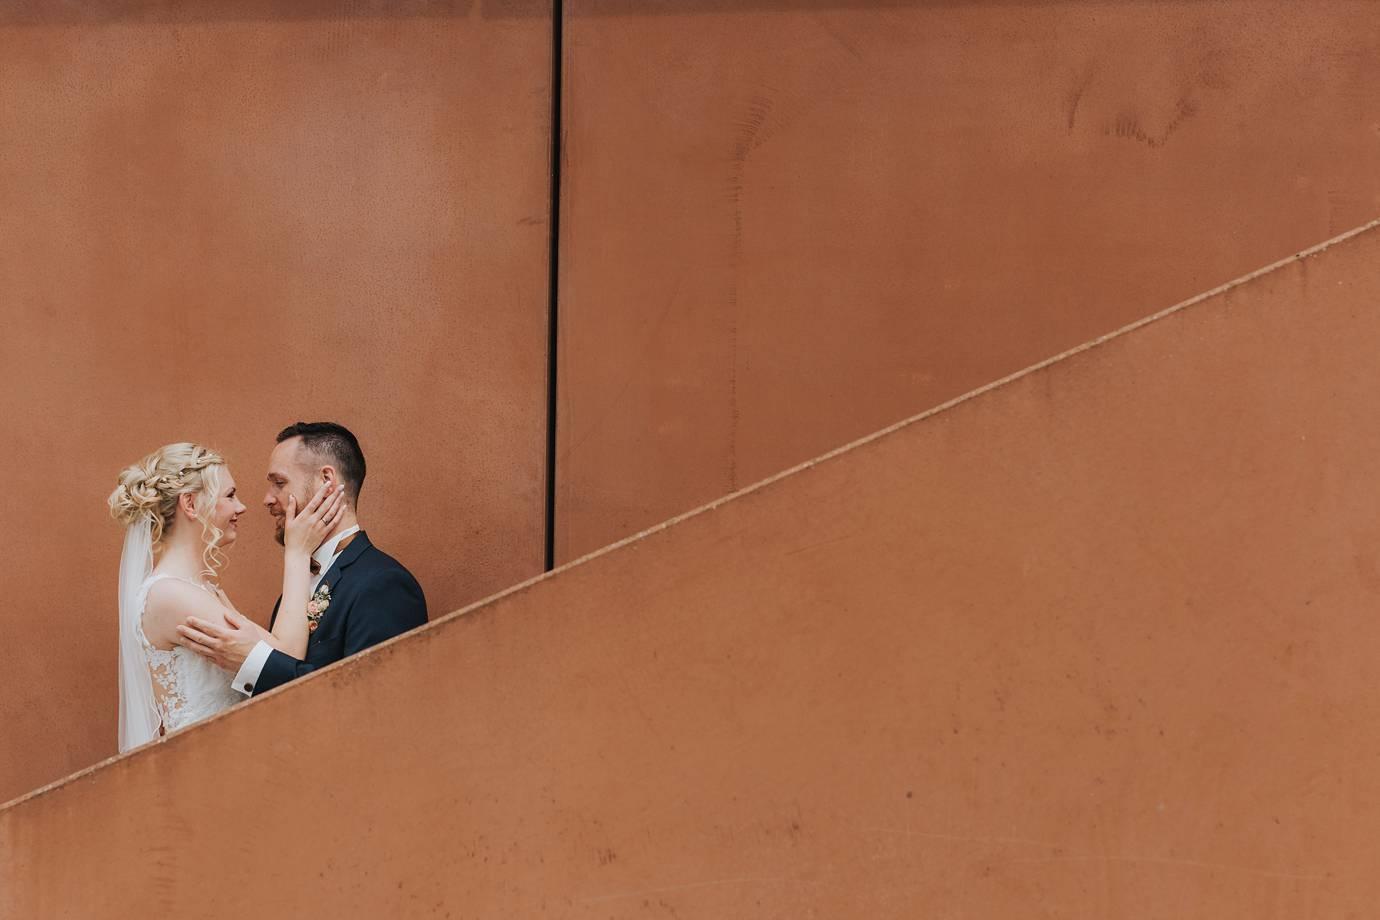 hochzeitsfotograf weyhe 122 - Ricarda+Hendrik